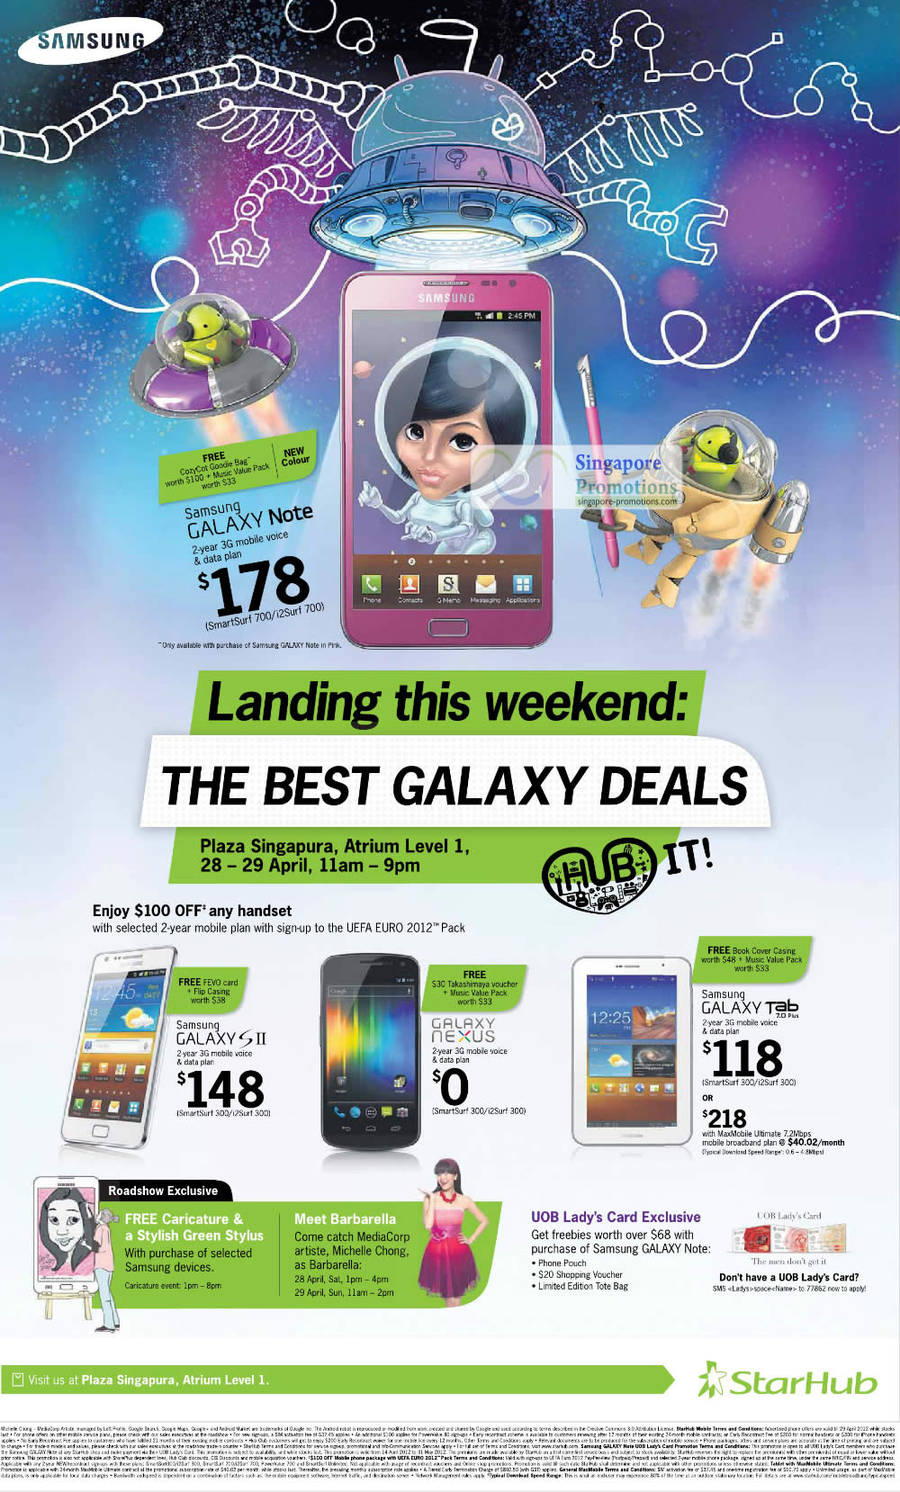 Samsung Galaxy Note, Galaxy S II, Galaxy Nexus, Galaxy Tab 7.0 Plus